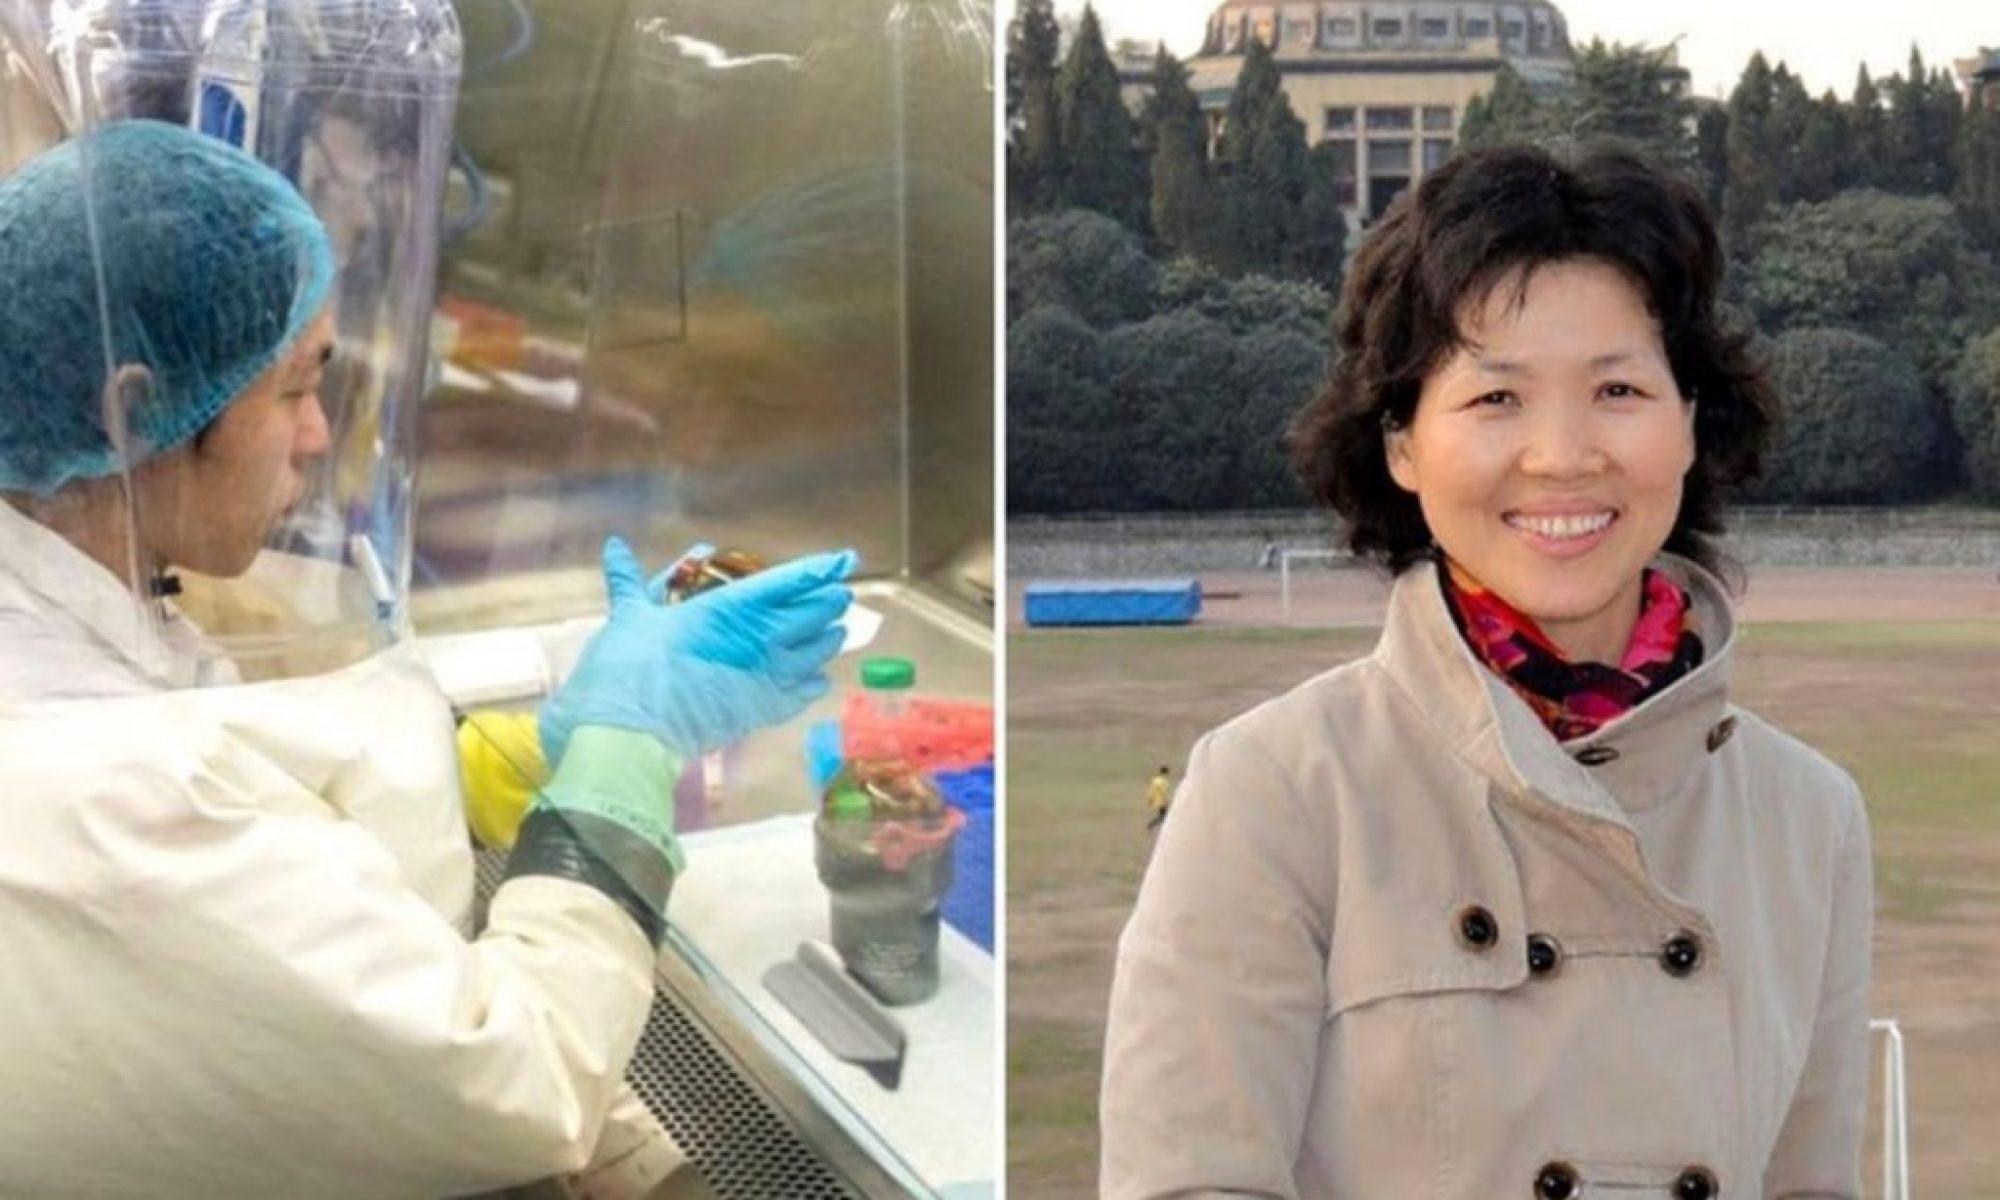 Yarasa kadın olarak bilinen Shi Zhengli Coronavirüs konusunda susturuldu mu?